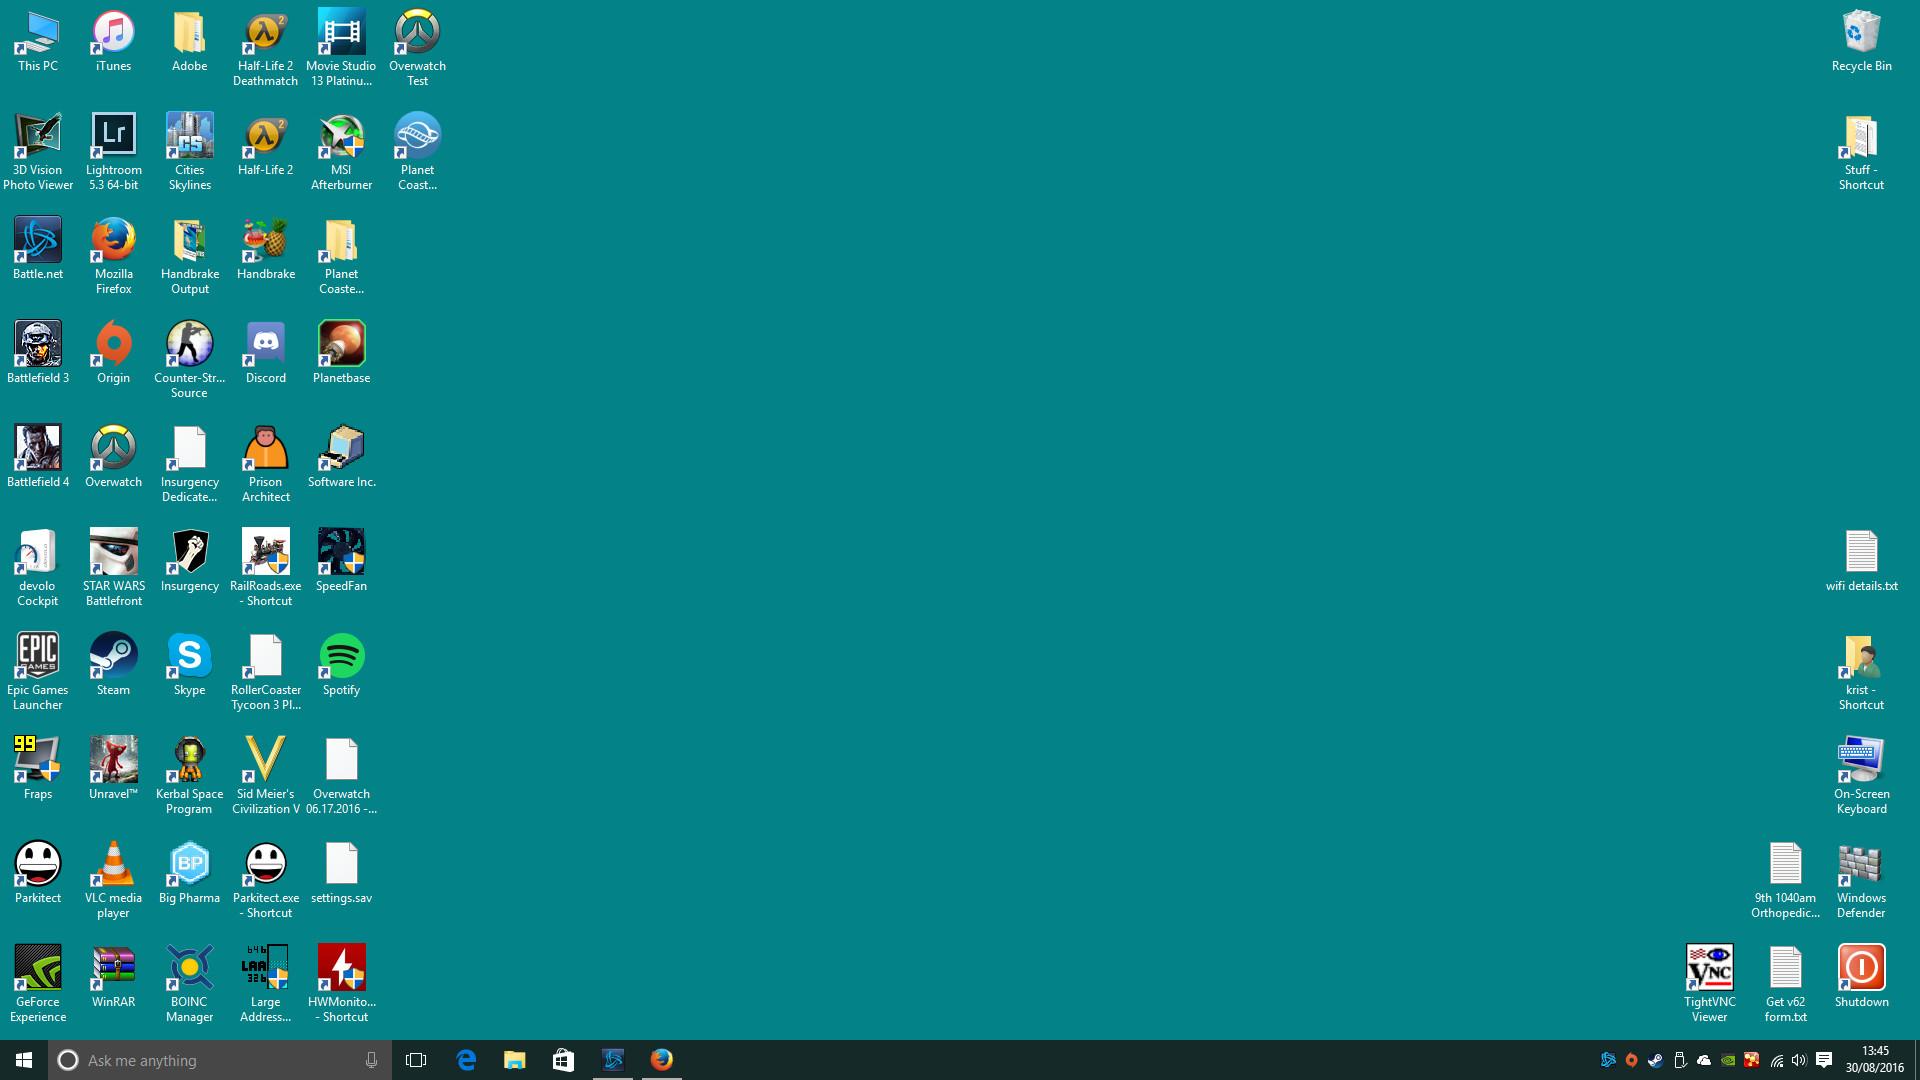 Download Windows 95 Desktop Wallpaper Hd Backgrounds